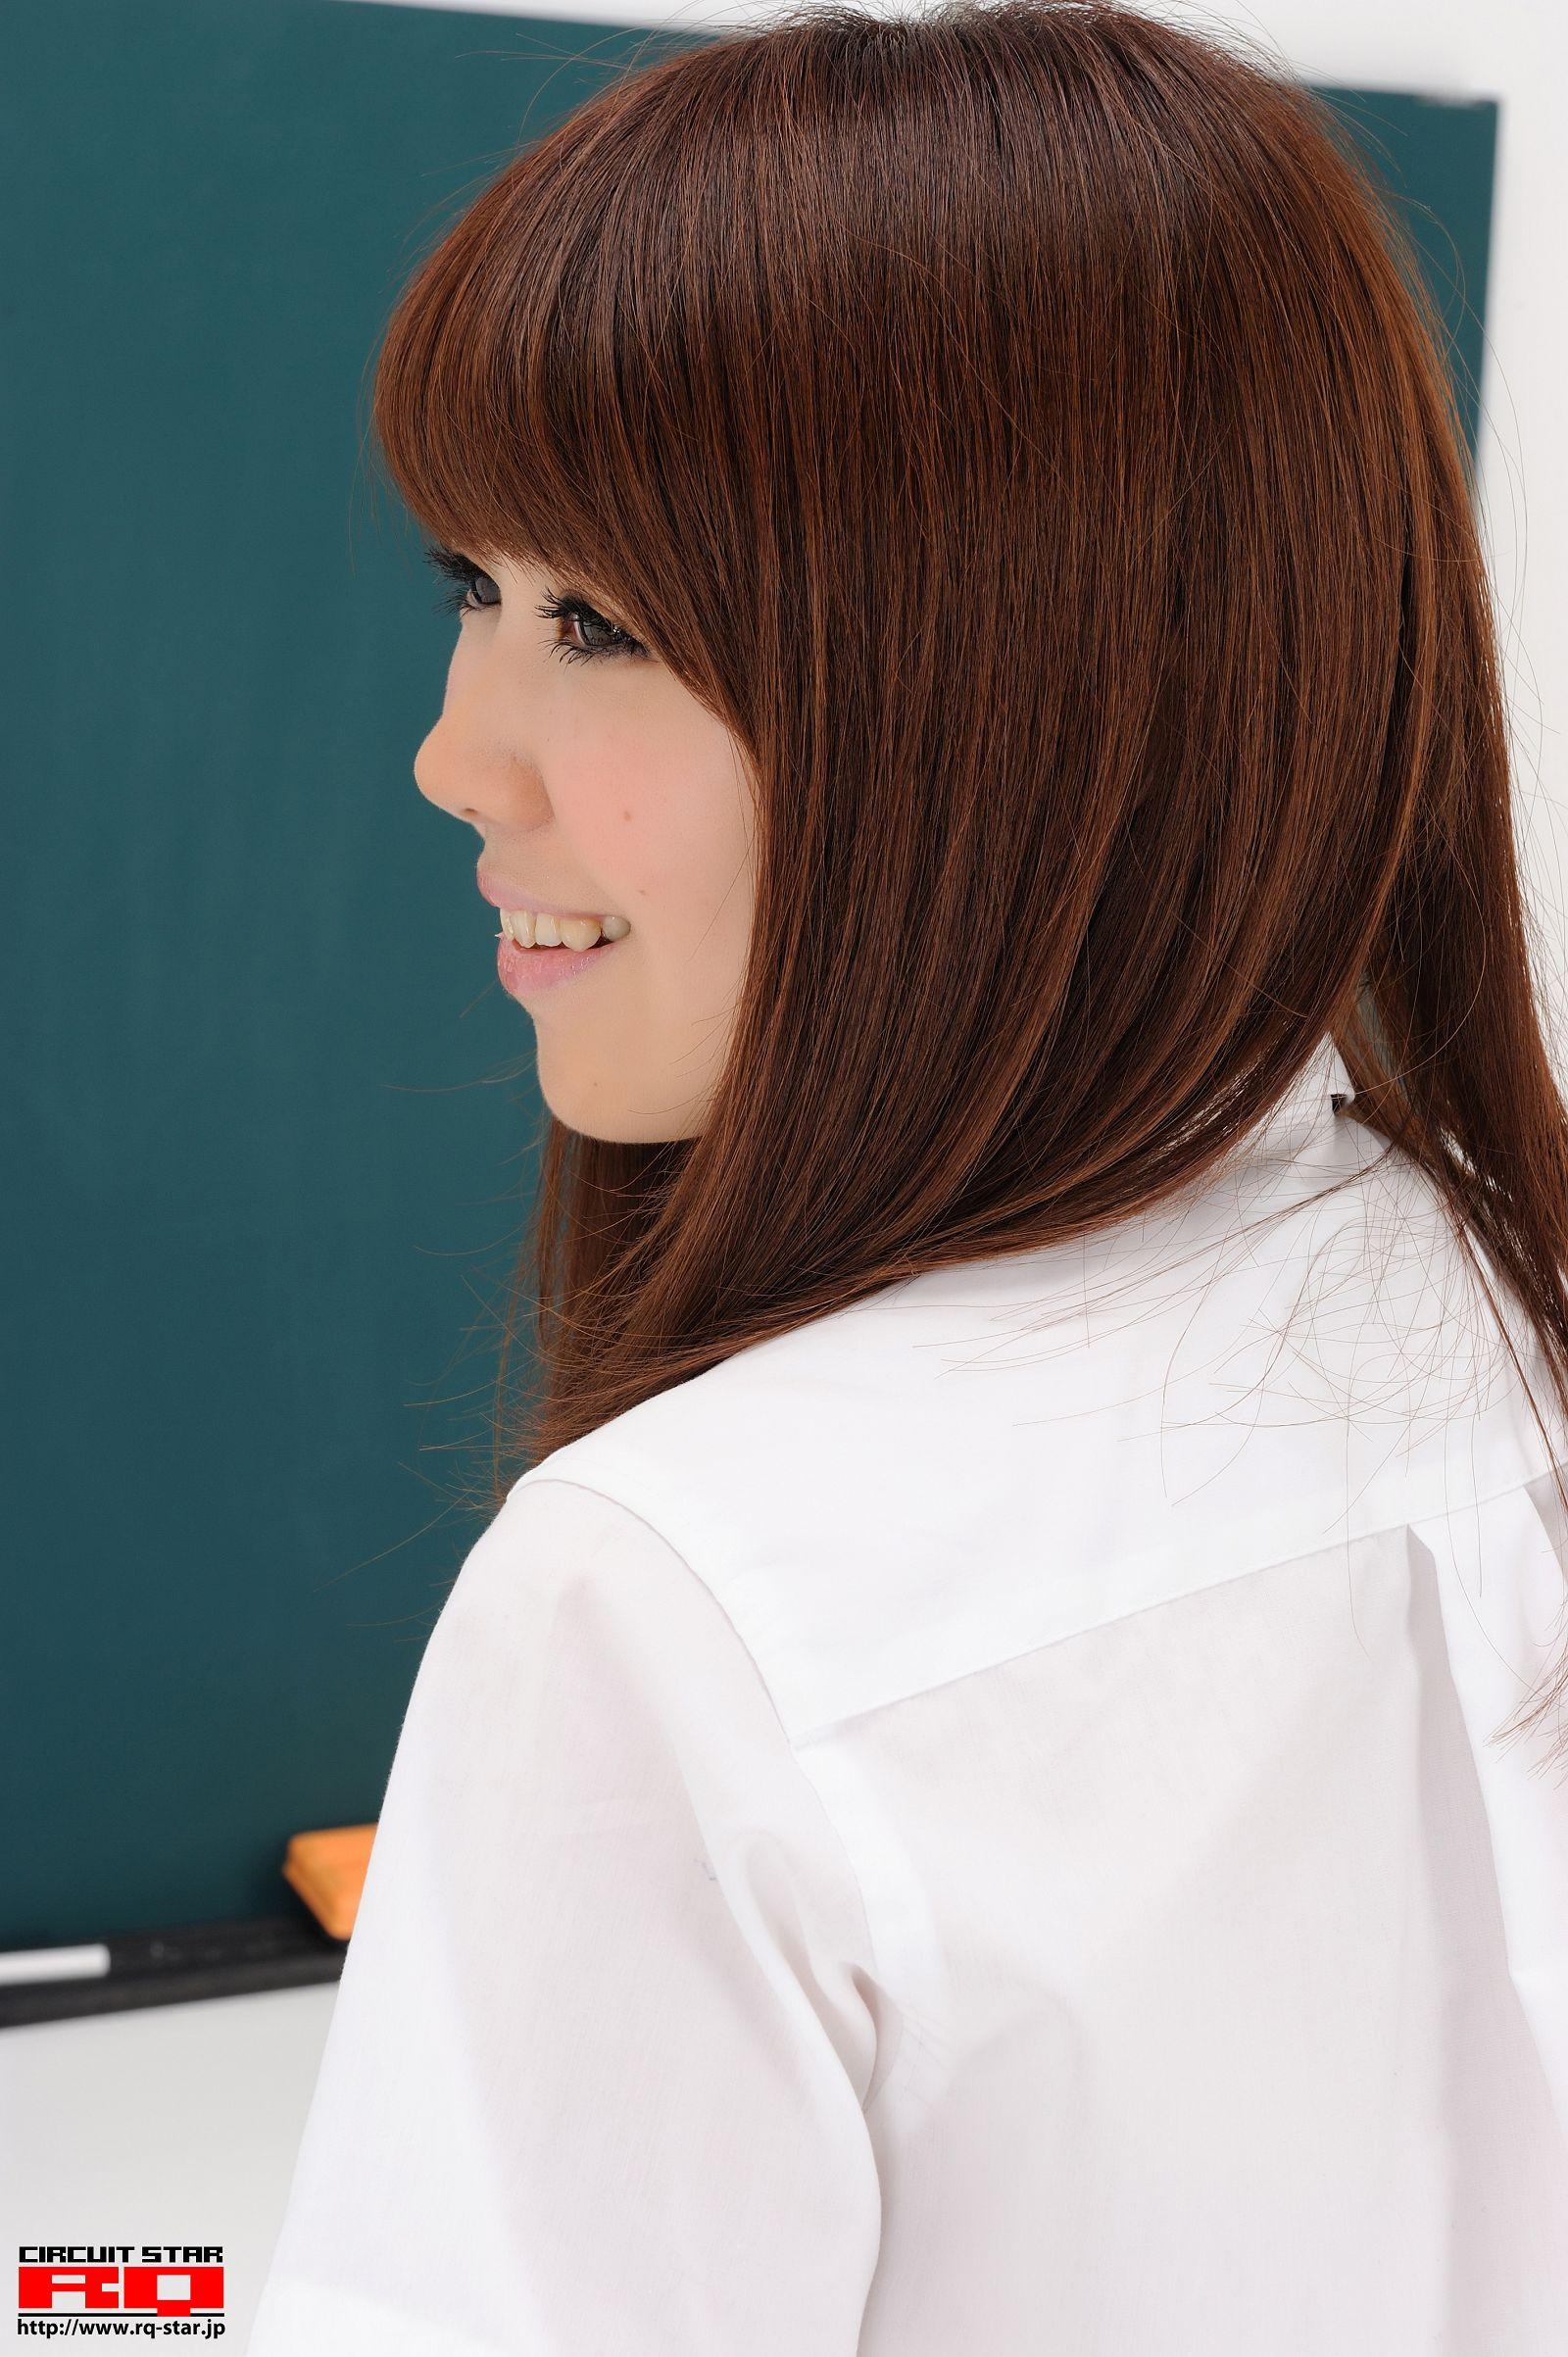 [RQ STAR美女] NO.0378 Haruka Ikuta 生田晴香 School Girl[119P] RQ STAR 第3张